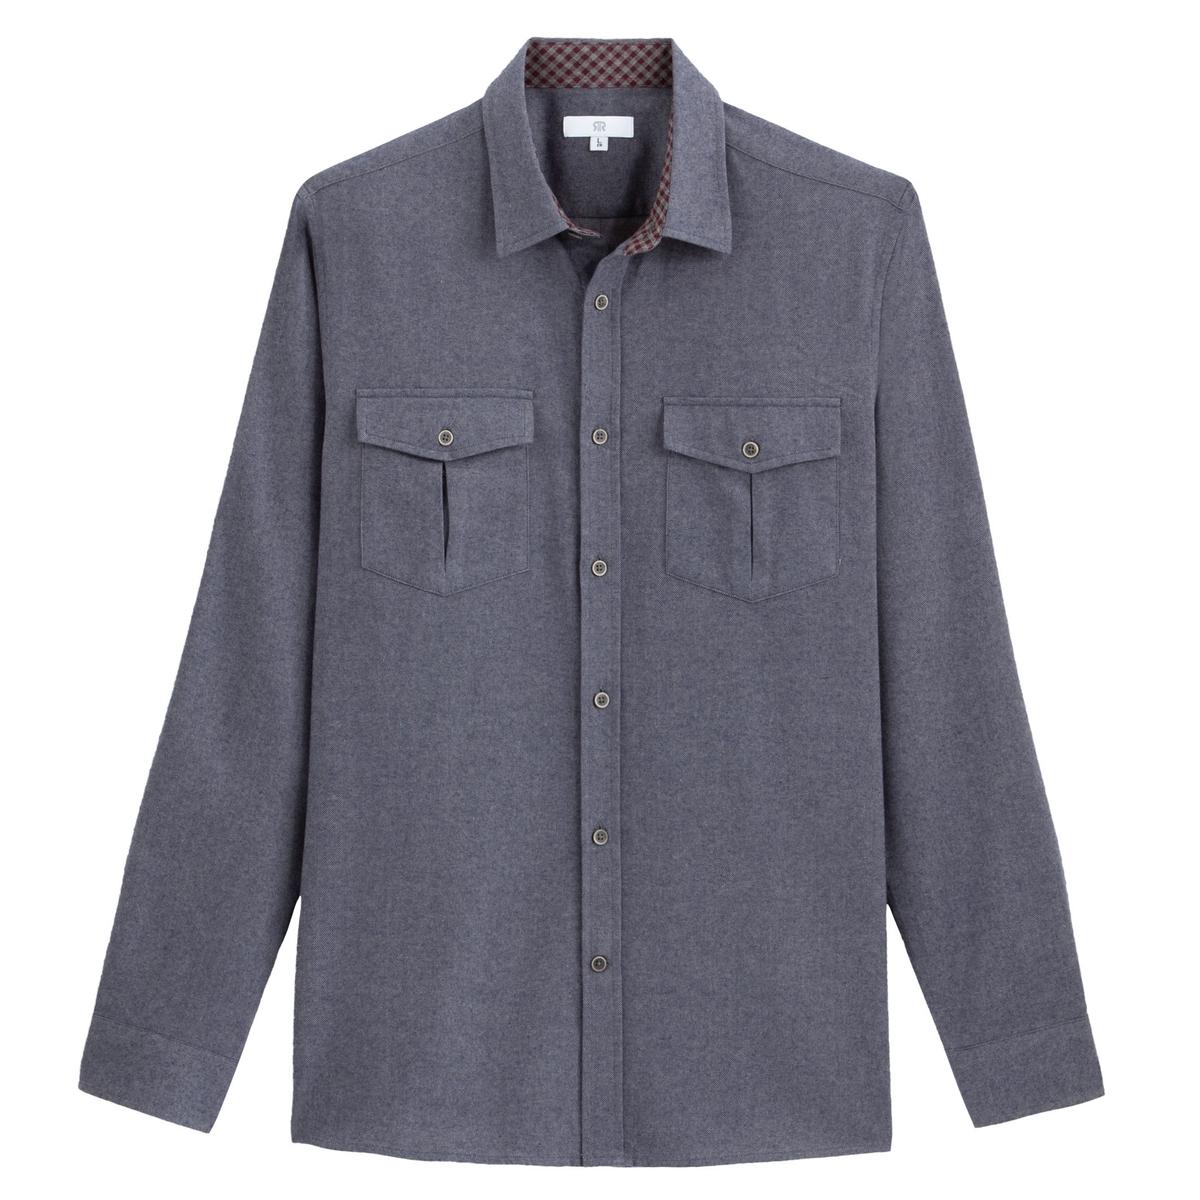 Camisa recta de franela, de manga larga